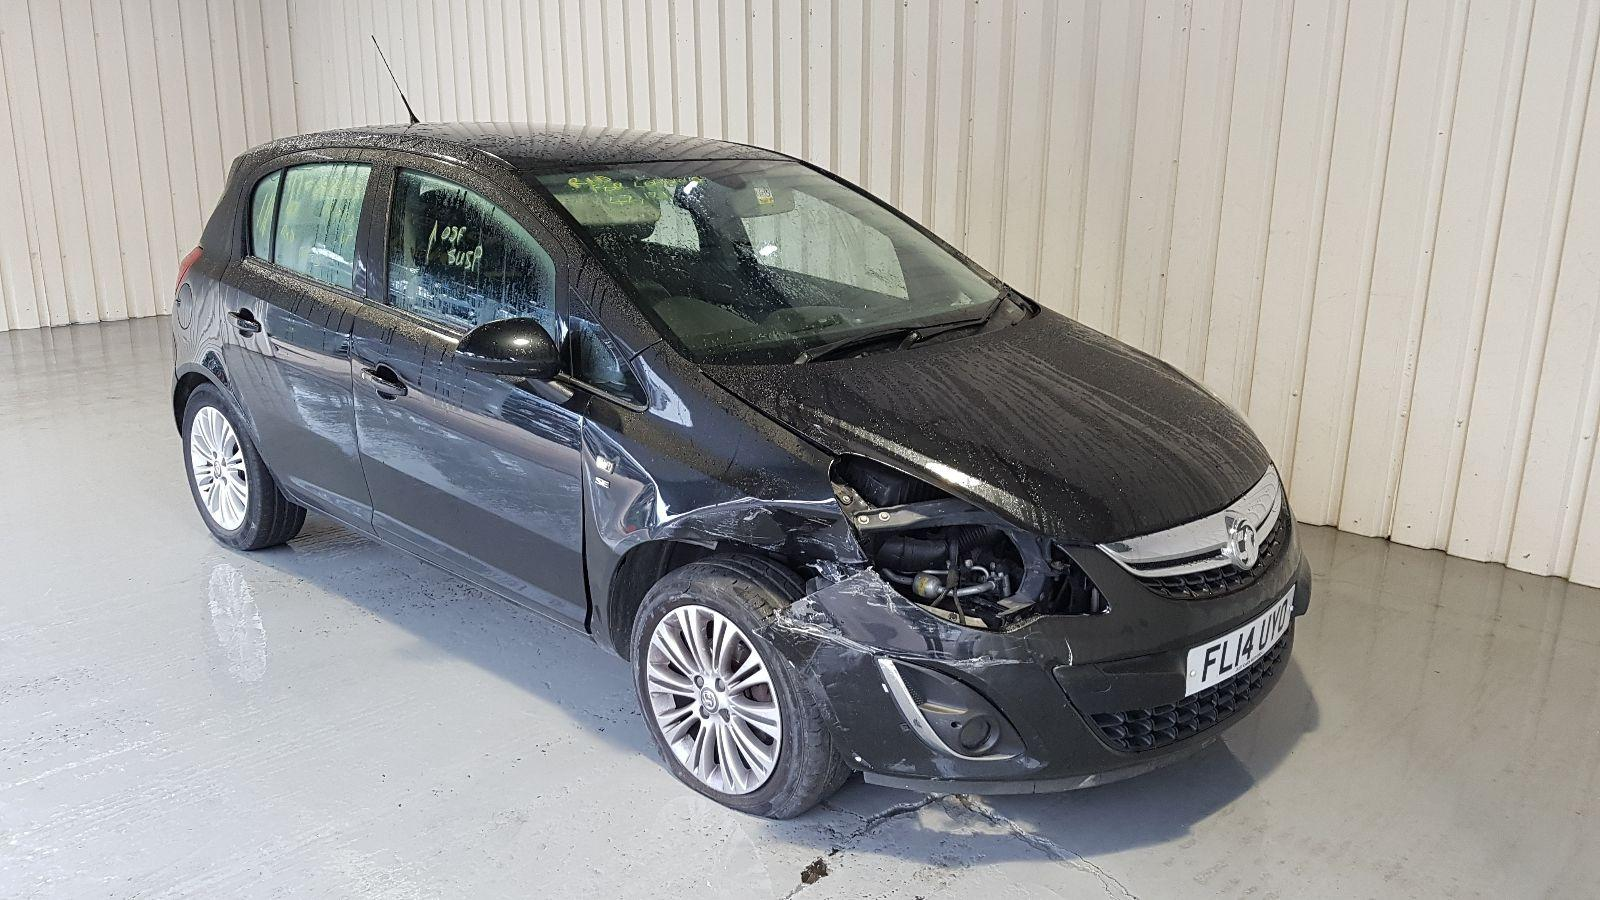 Image for a Vauxhall Corsa 2014 5 Door Hatchback